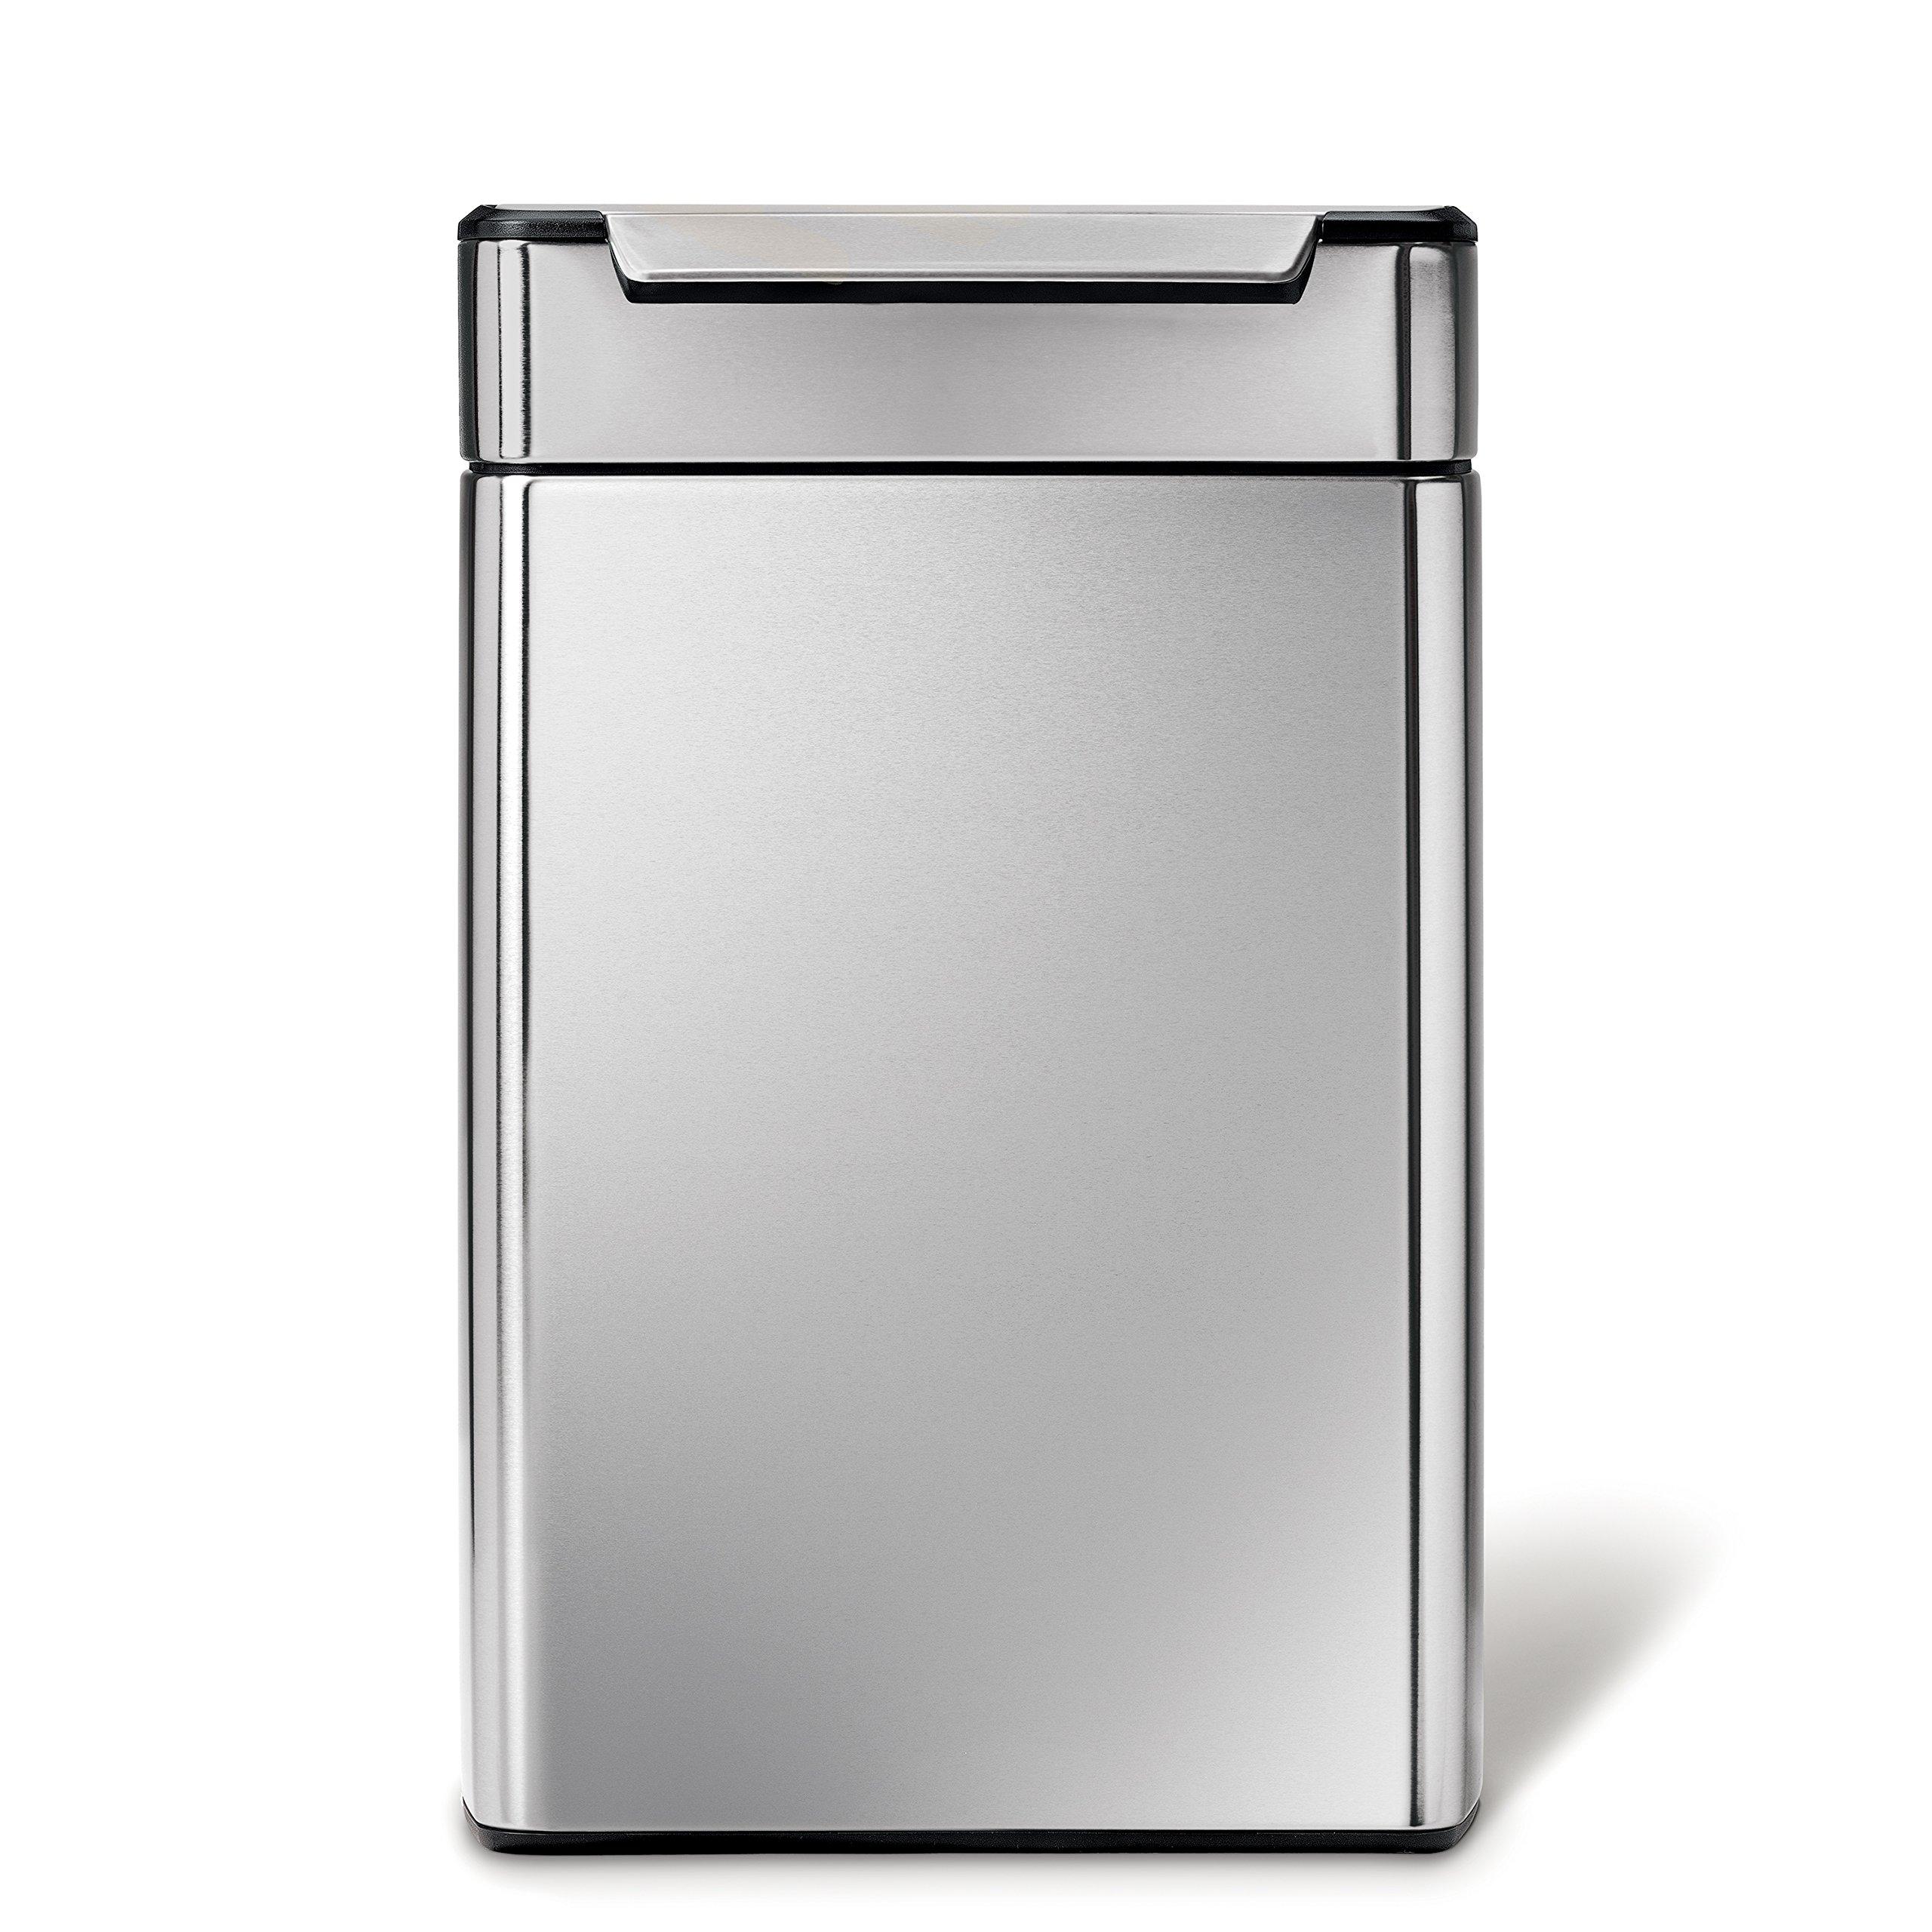 dual compartment trash can simplehuman simplehuman 48 liter 127 gallon stainless steel touchbar kitchen dual compartment trash can cheap can find